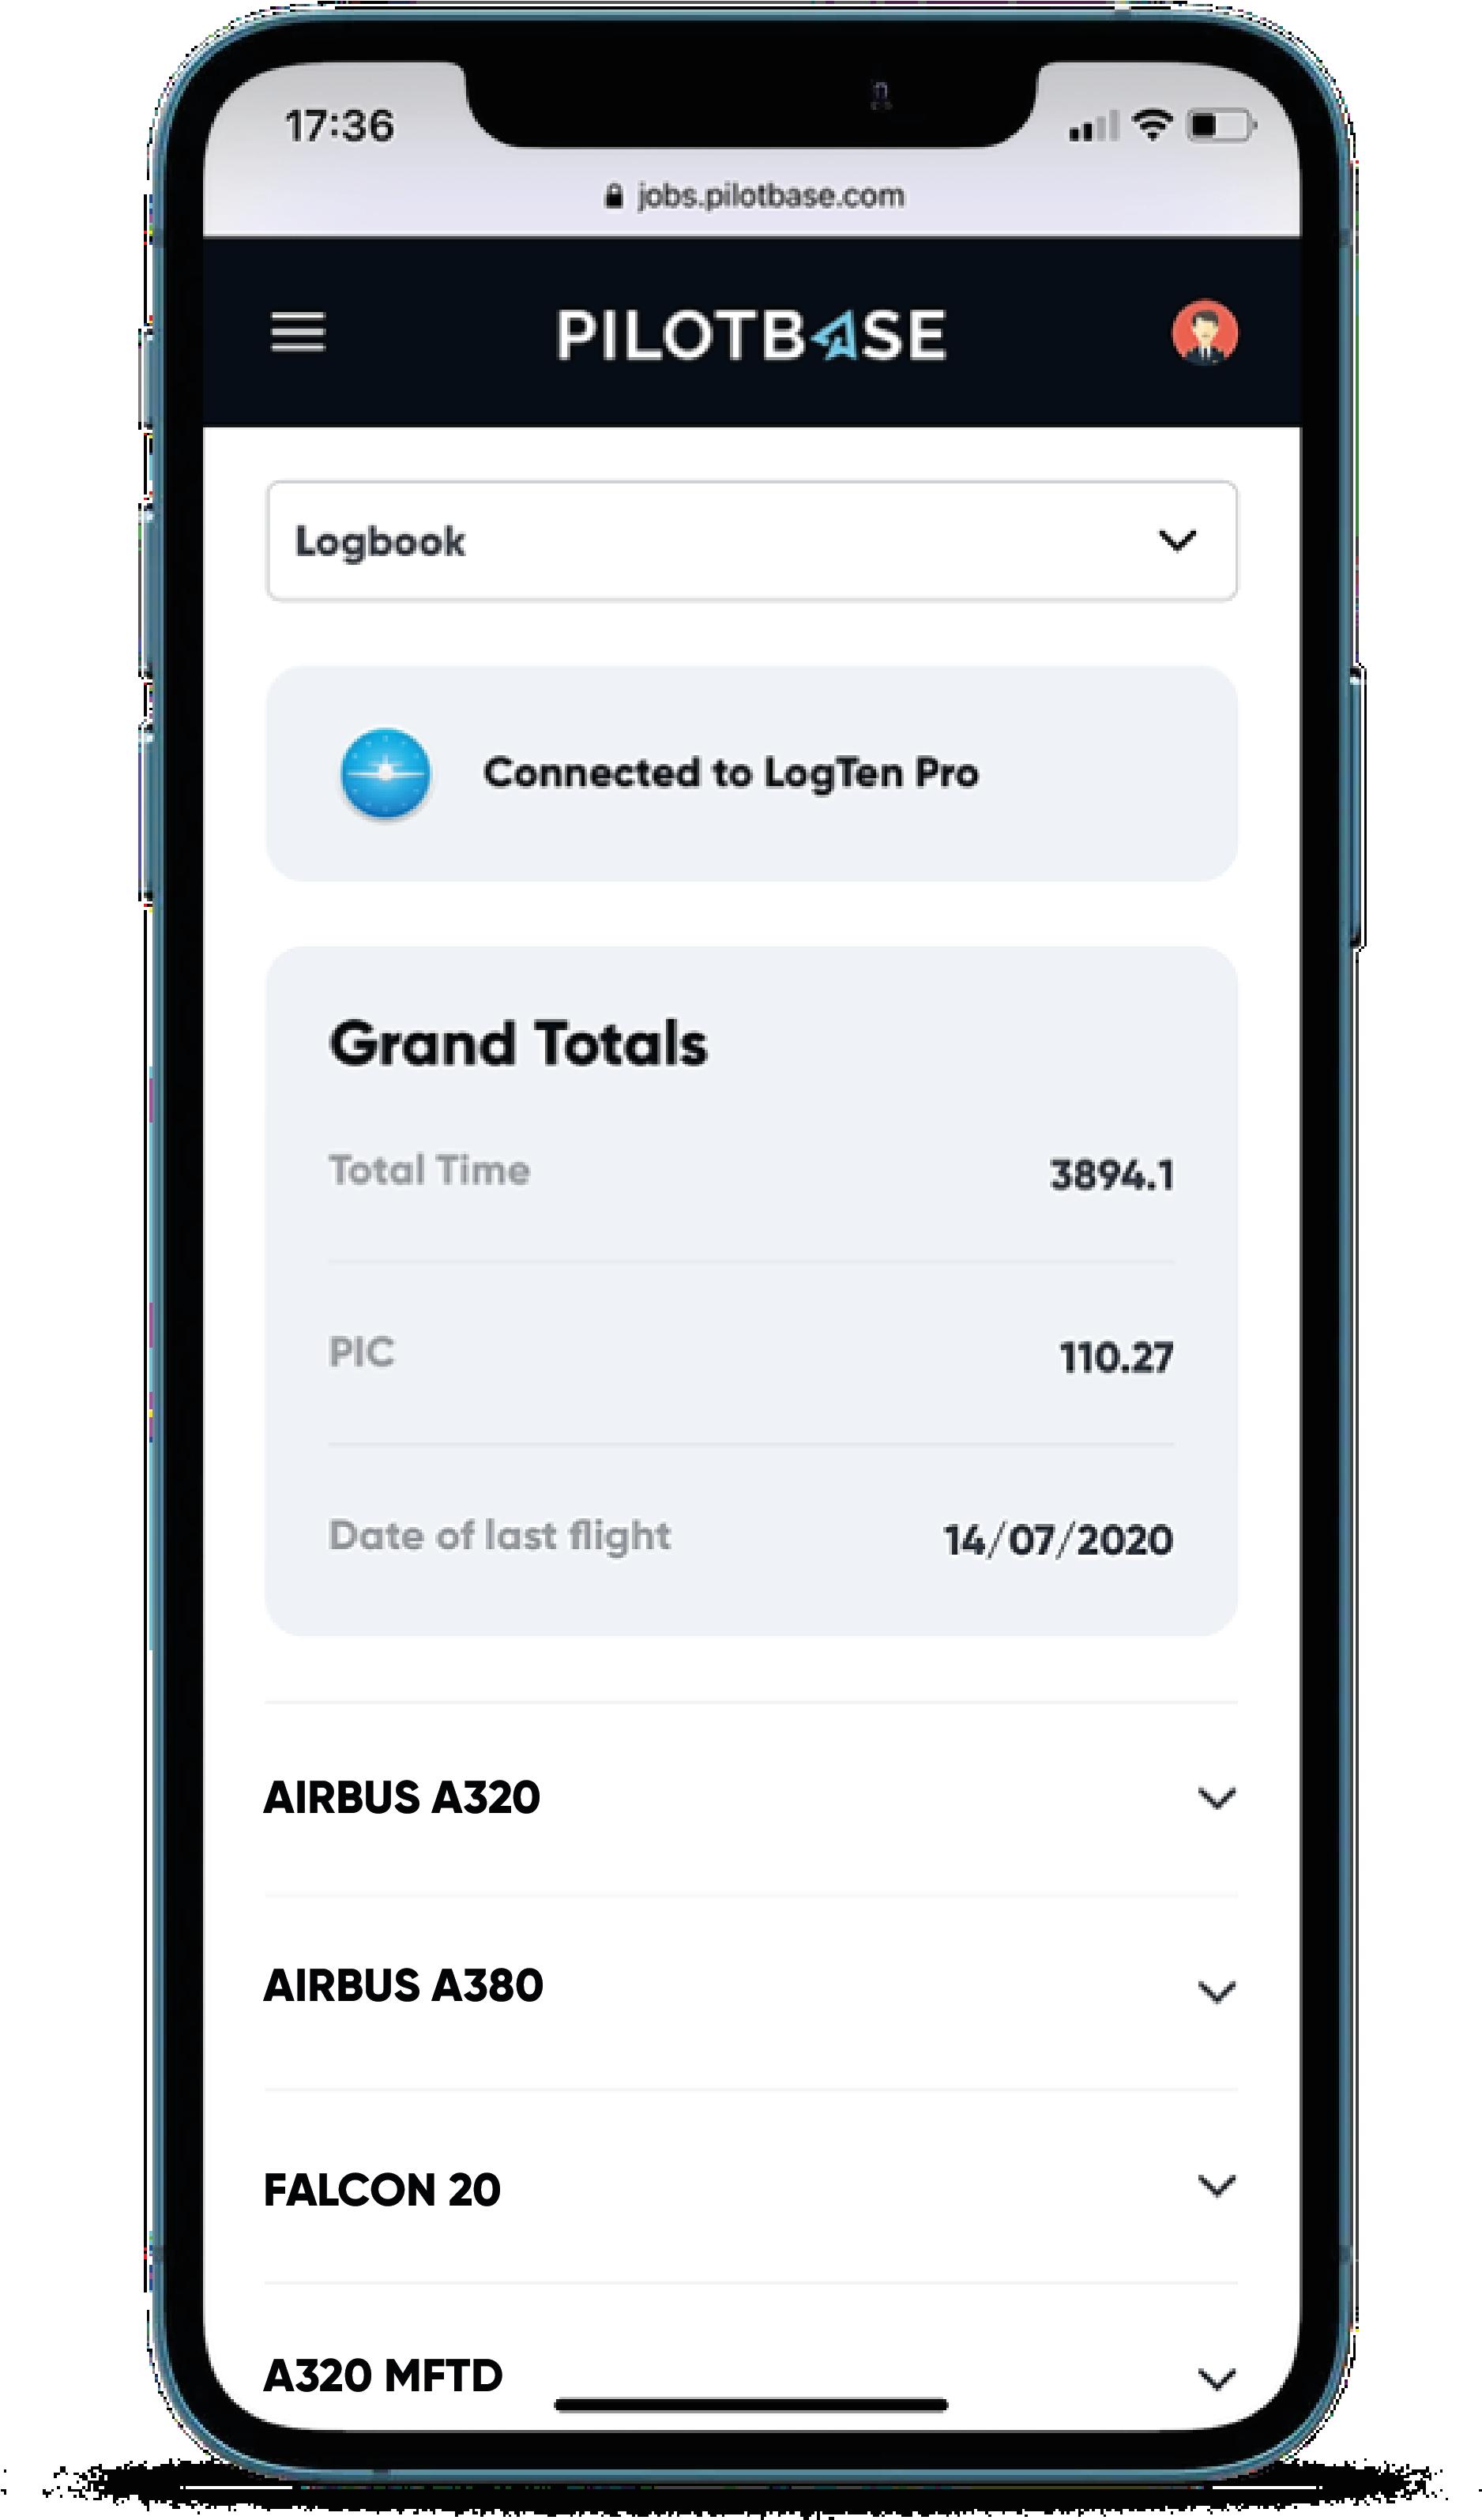 Pilotbase Pilot Profile Screen on iPhone, linked to LogTen Pro